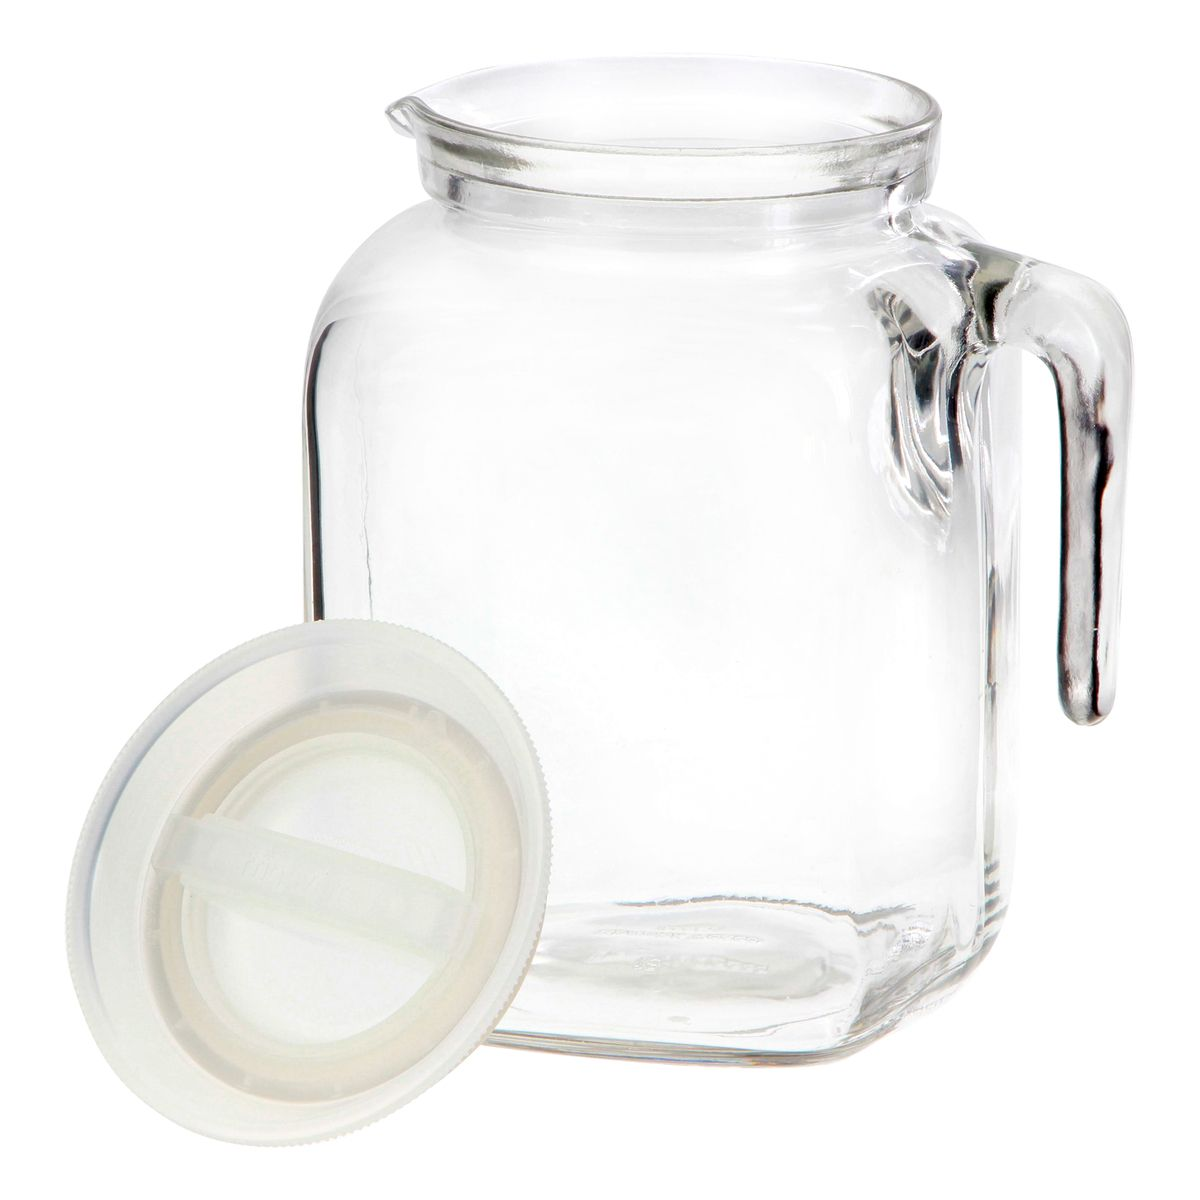 Broc transparent en verre avec couvercle blanc 2l Frigoverre - Bormioli